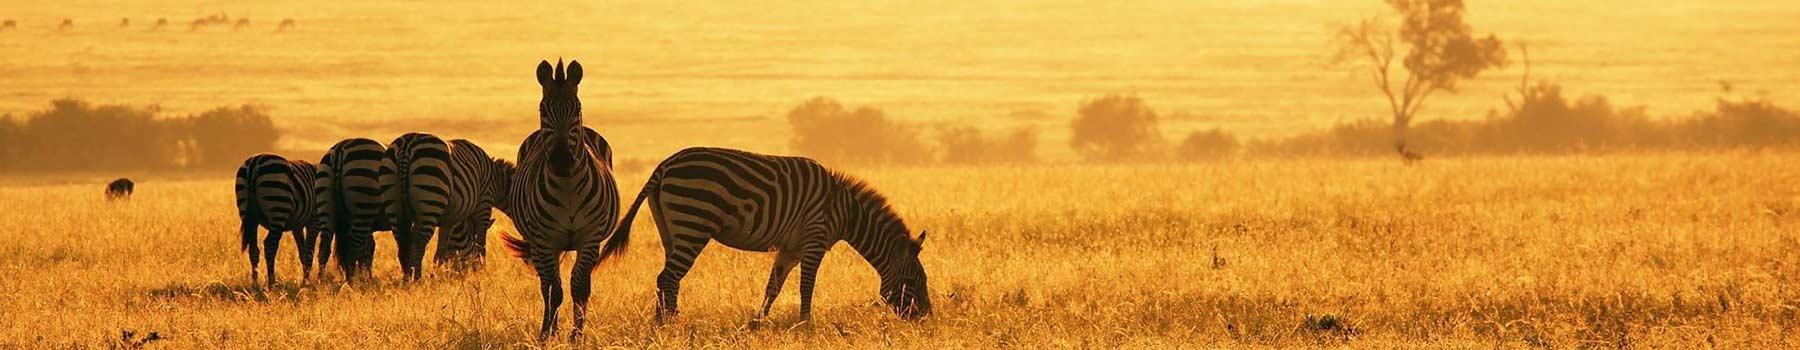 how to change background on safari